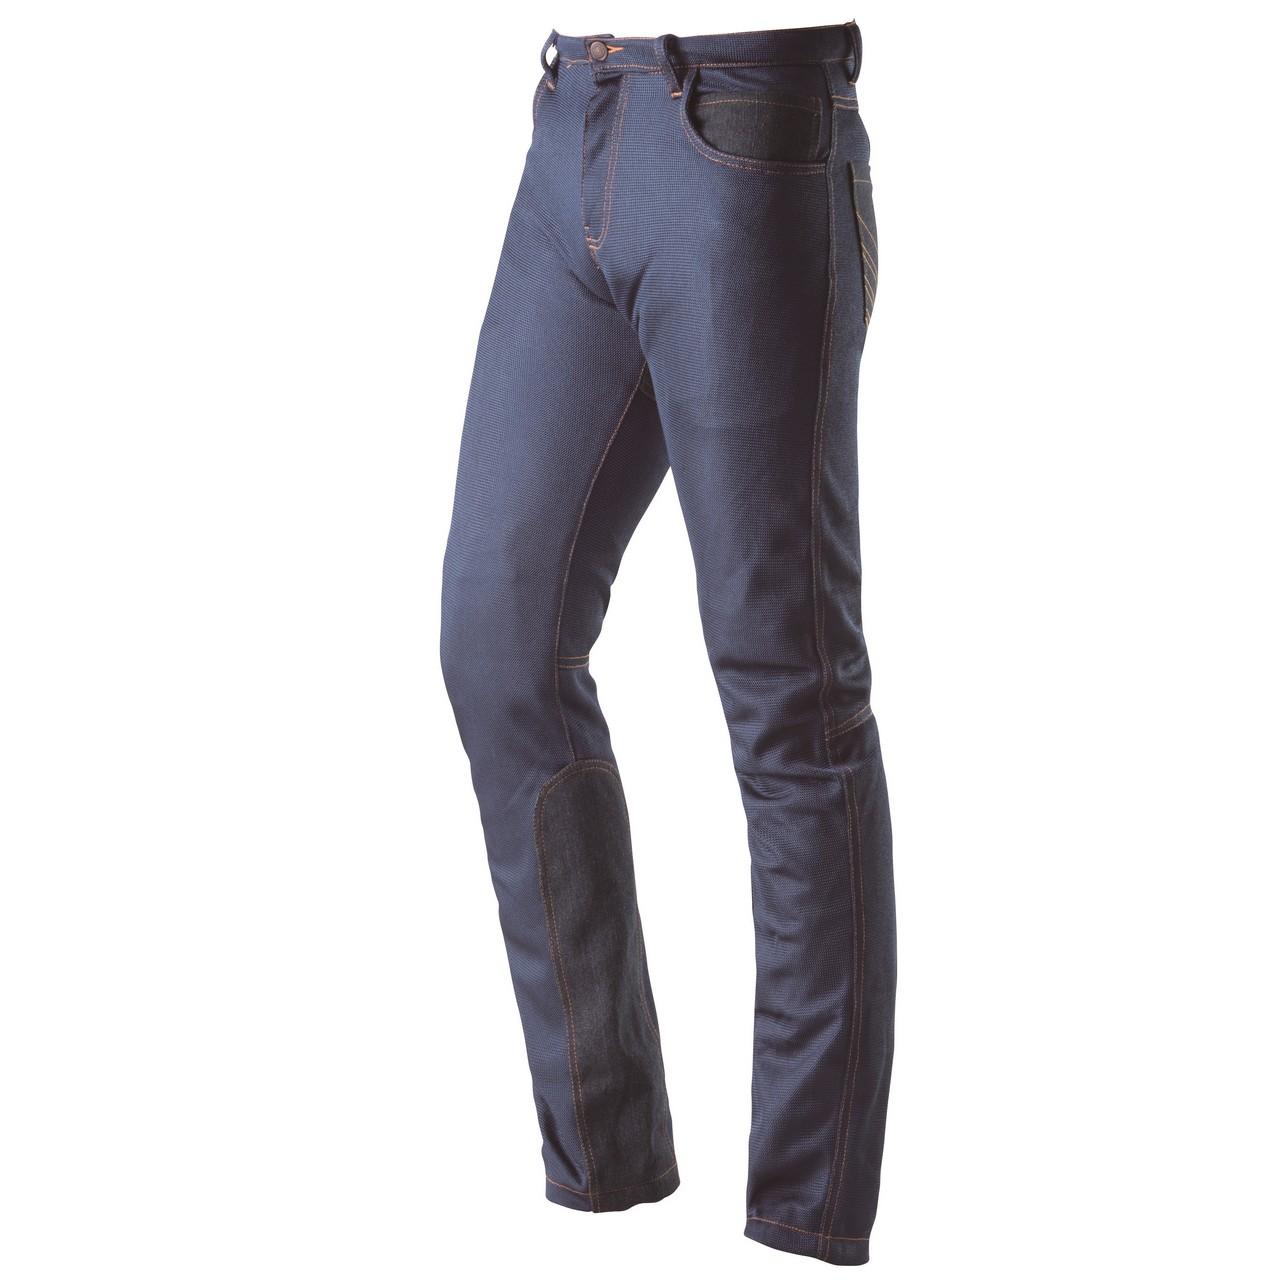 honda riding gear fr hling sommerbekleidung mesh denim style pants sonderange 0syex x23 vbl. Black Bedroom Furniture Sets. Home Design Ideas